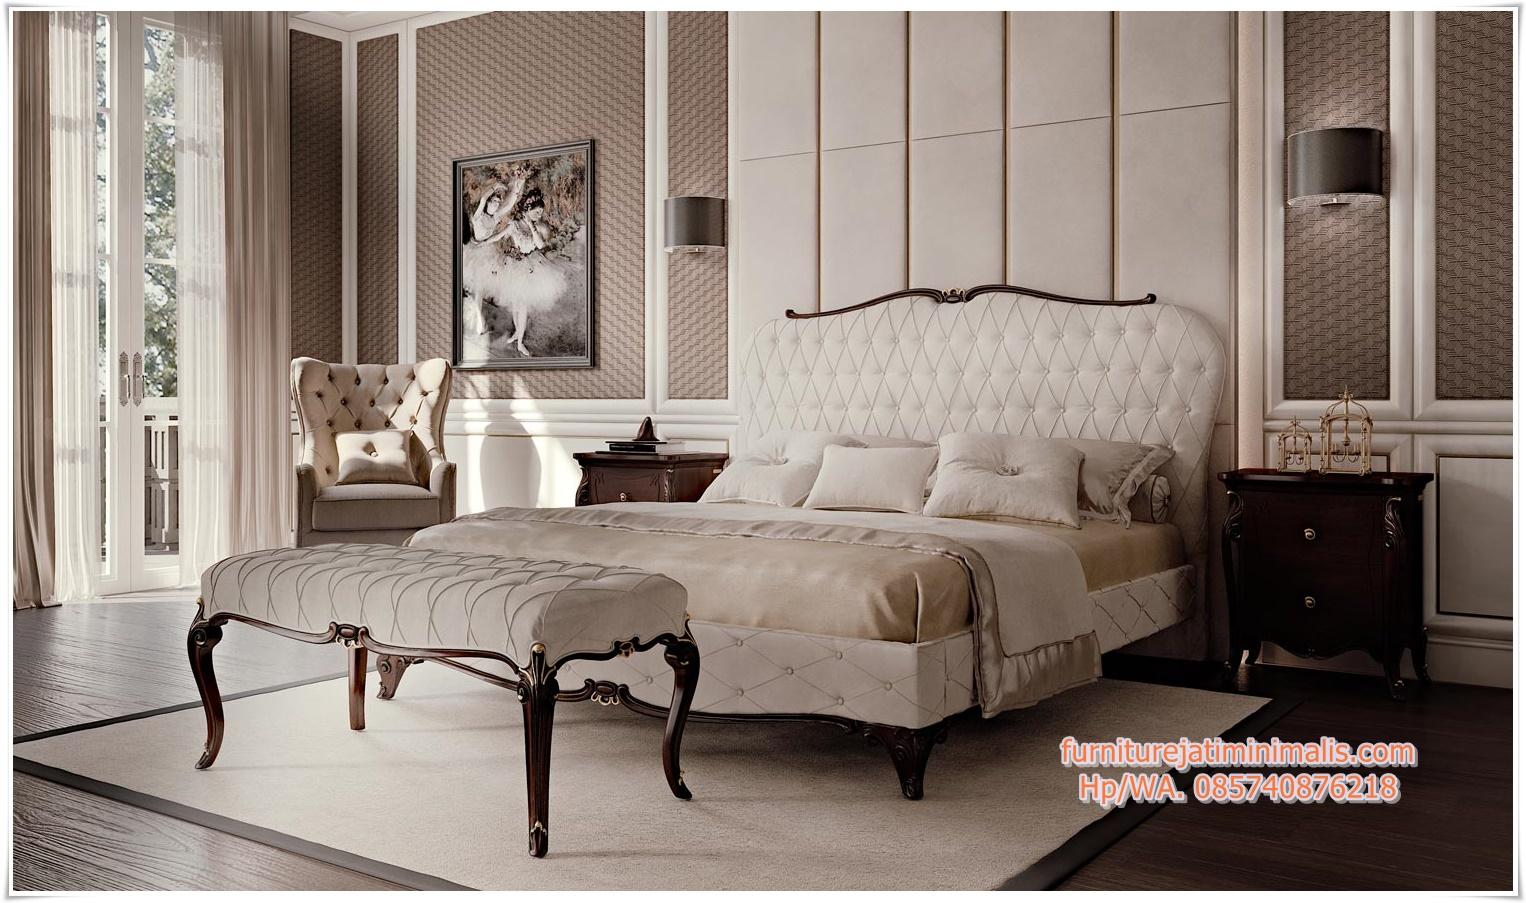 tempat tidur sederhana manufacto, tempat tidur sederhana murah, tempat tidur, tempat tidur sederhana, tempat tdiur sederhana dari kayu, tempat tidur sederhana jepara, tempat tidur sederhana tapi elegan, tempat tidur kayu sederhana, gambar tempat tidur sederhana, foto tempat tidur sederhana, model tempat tidur sederhana